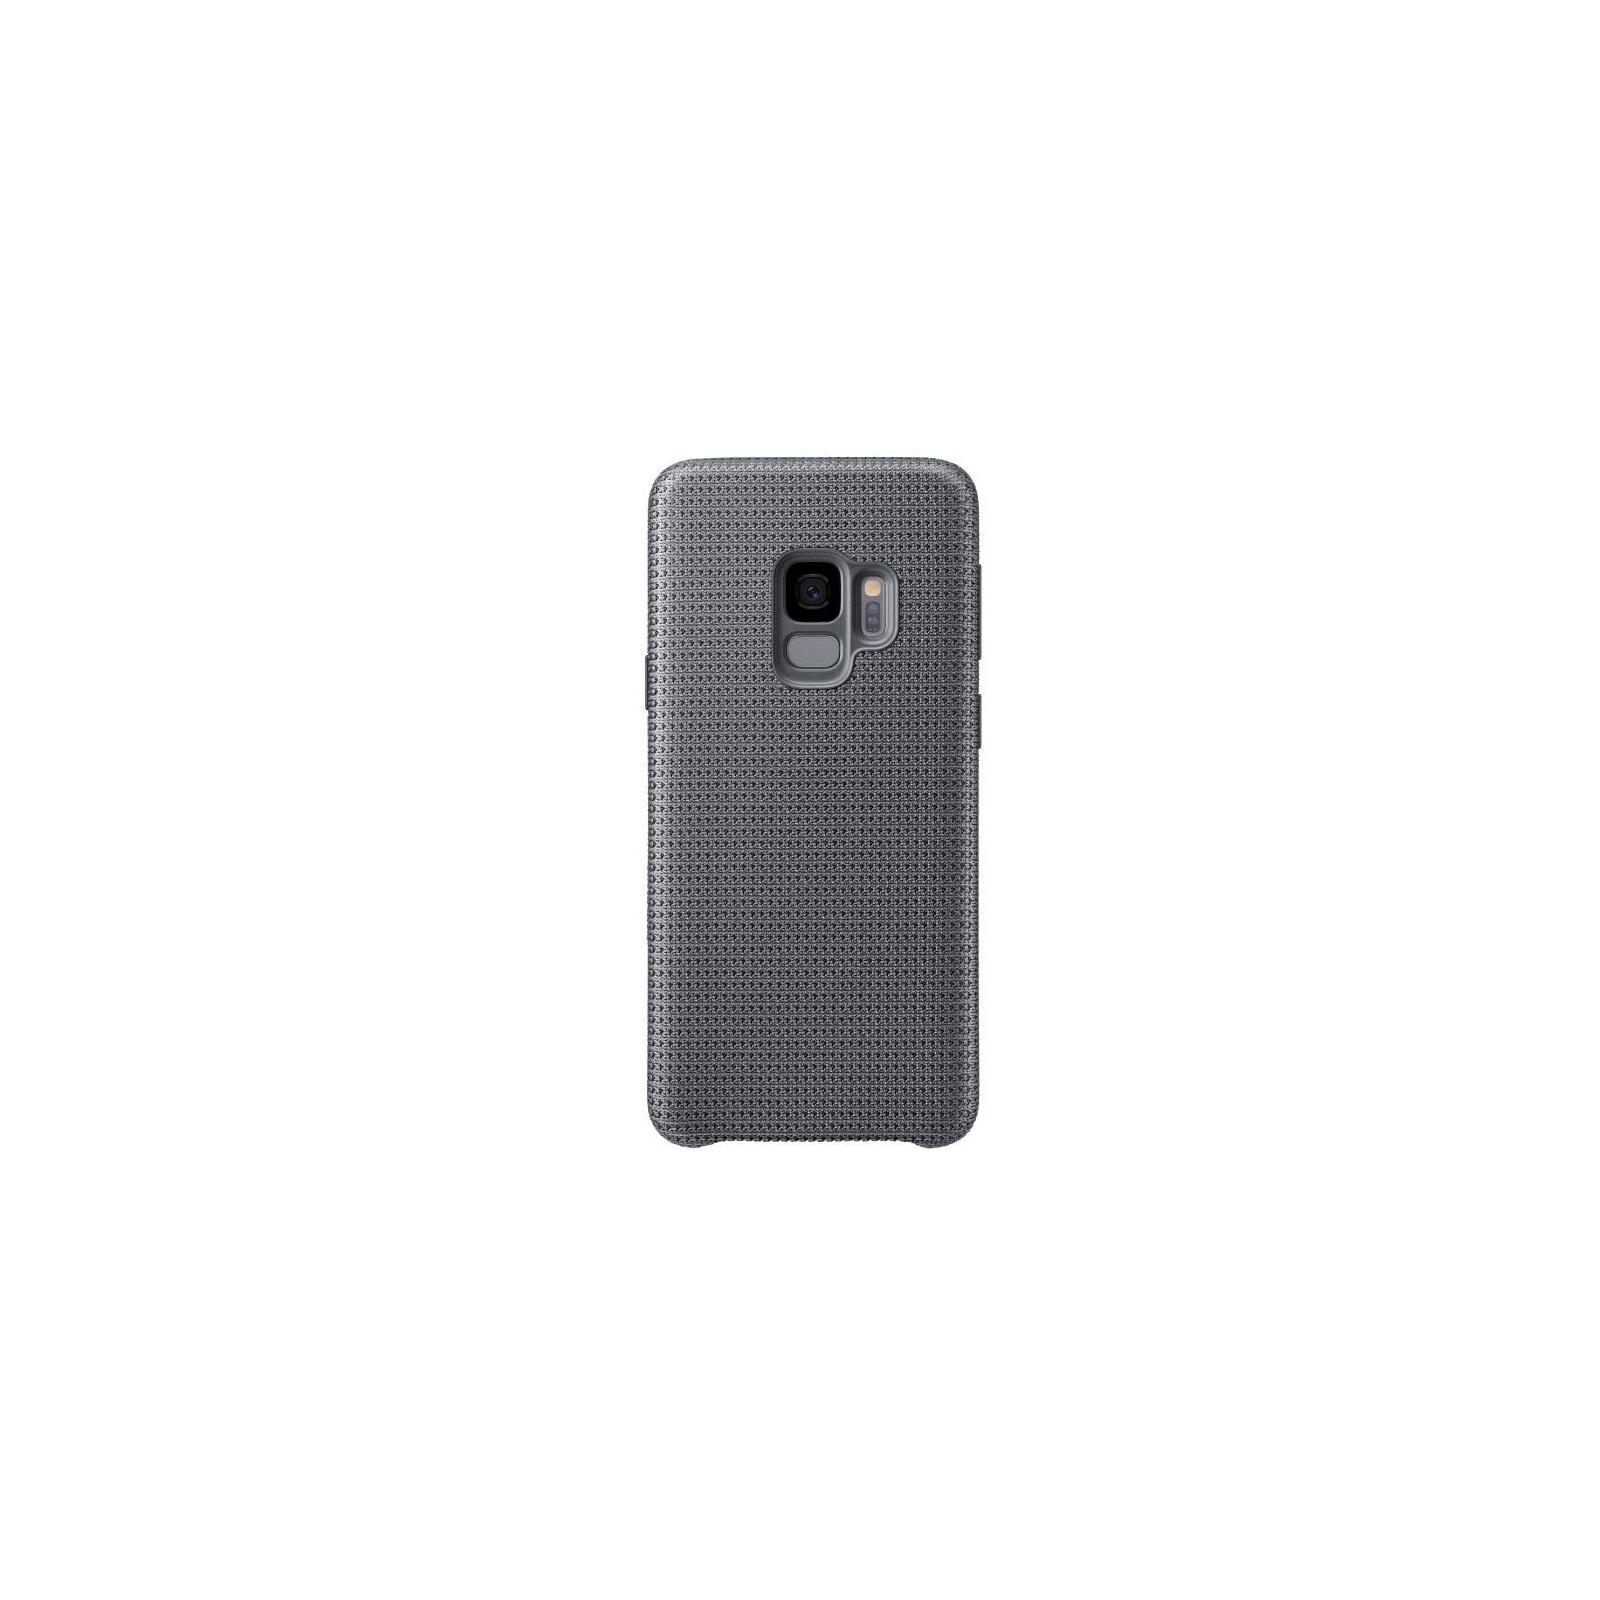 Чехол для моб. телефона Samsung для Galaxy S9 (G960) Hyperknit Cover Grey (EF-GG960FJEGRU) изображение 4